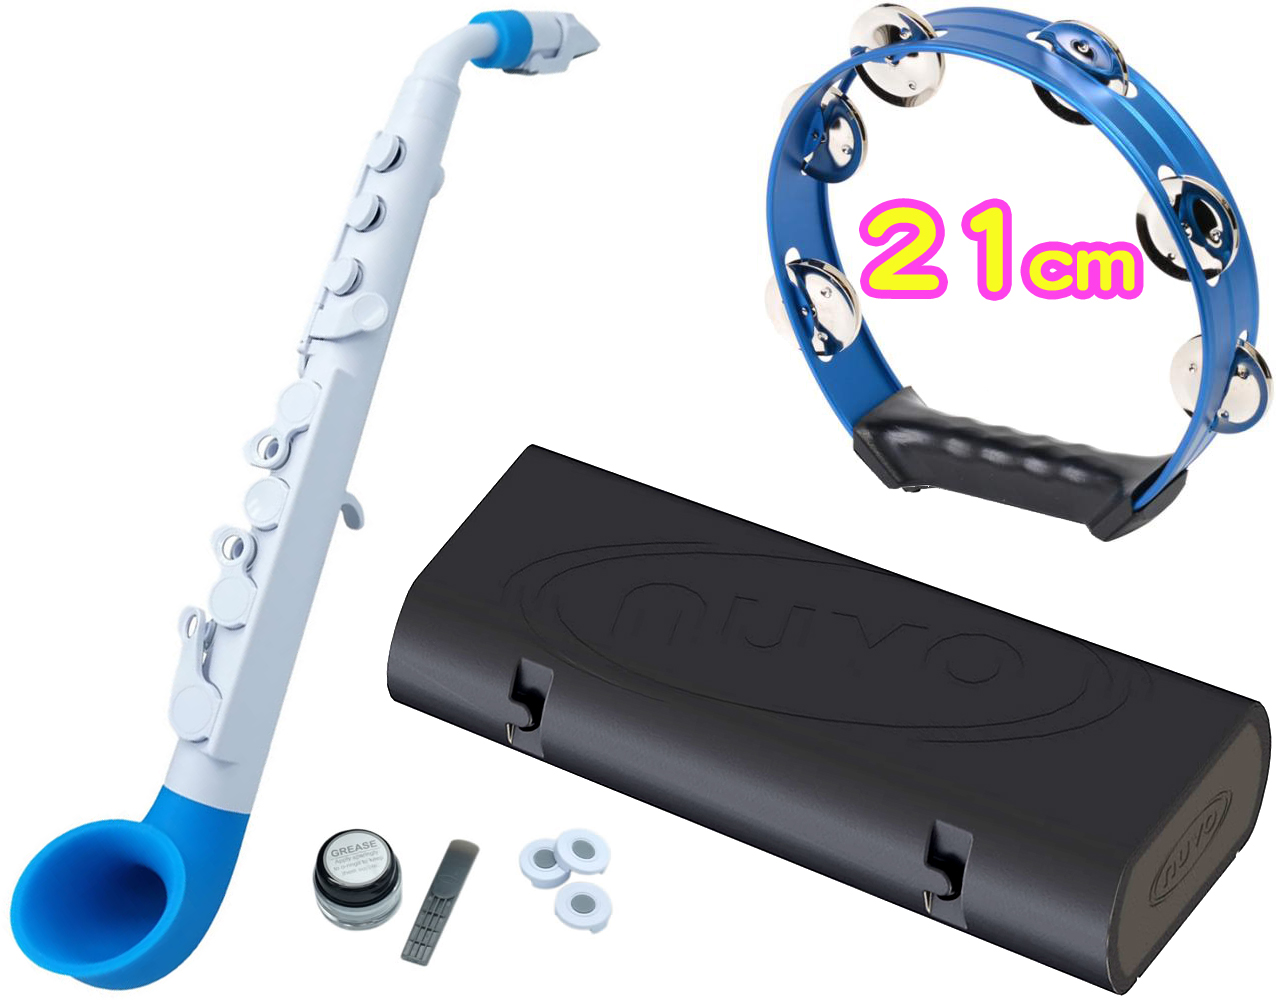 NUVO ( ヌーボ ) jSAX ホワイト ブルー N510JWBL プラスチック製 管楽器 サックス リード楽器 本体 サクソフォン 白色 青色 水色 Blue 【 jサックス WH/BL セット E】 送料無料